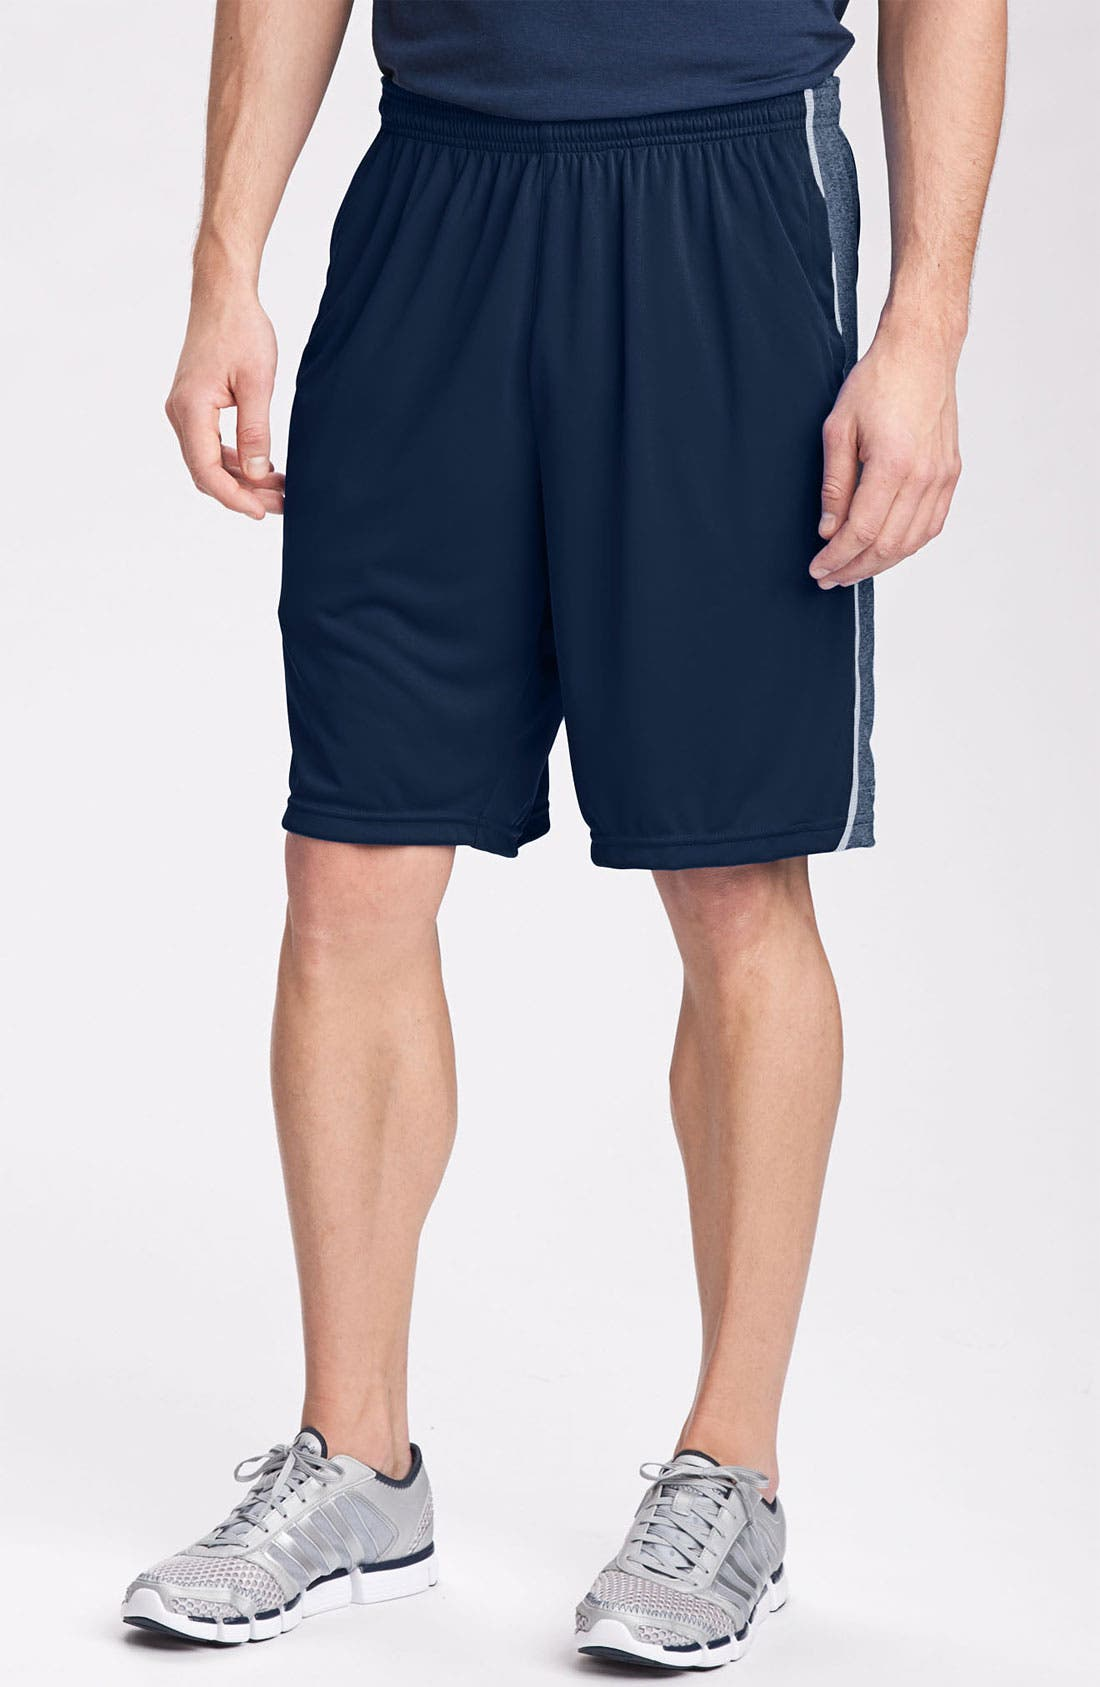 Alternate Image 1 Selected - adidas 'Force' Shorts